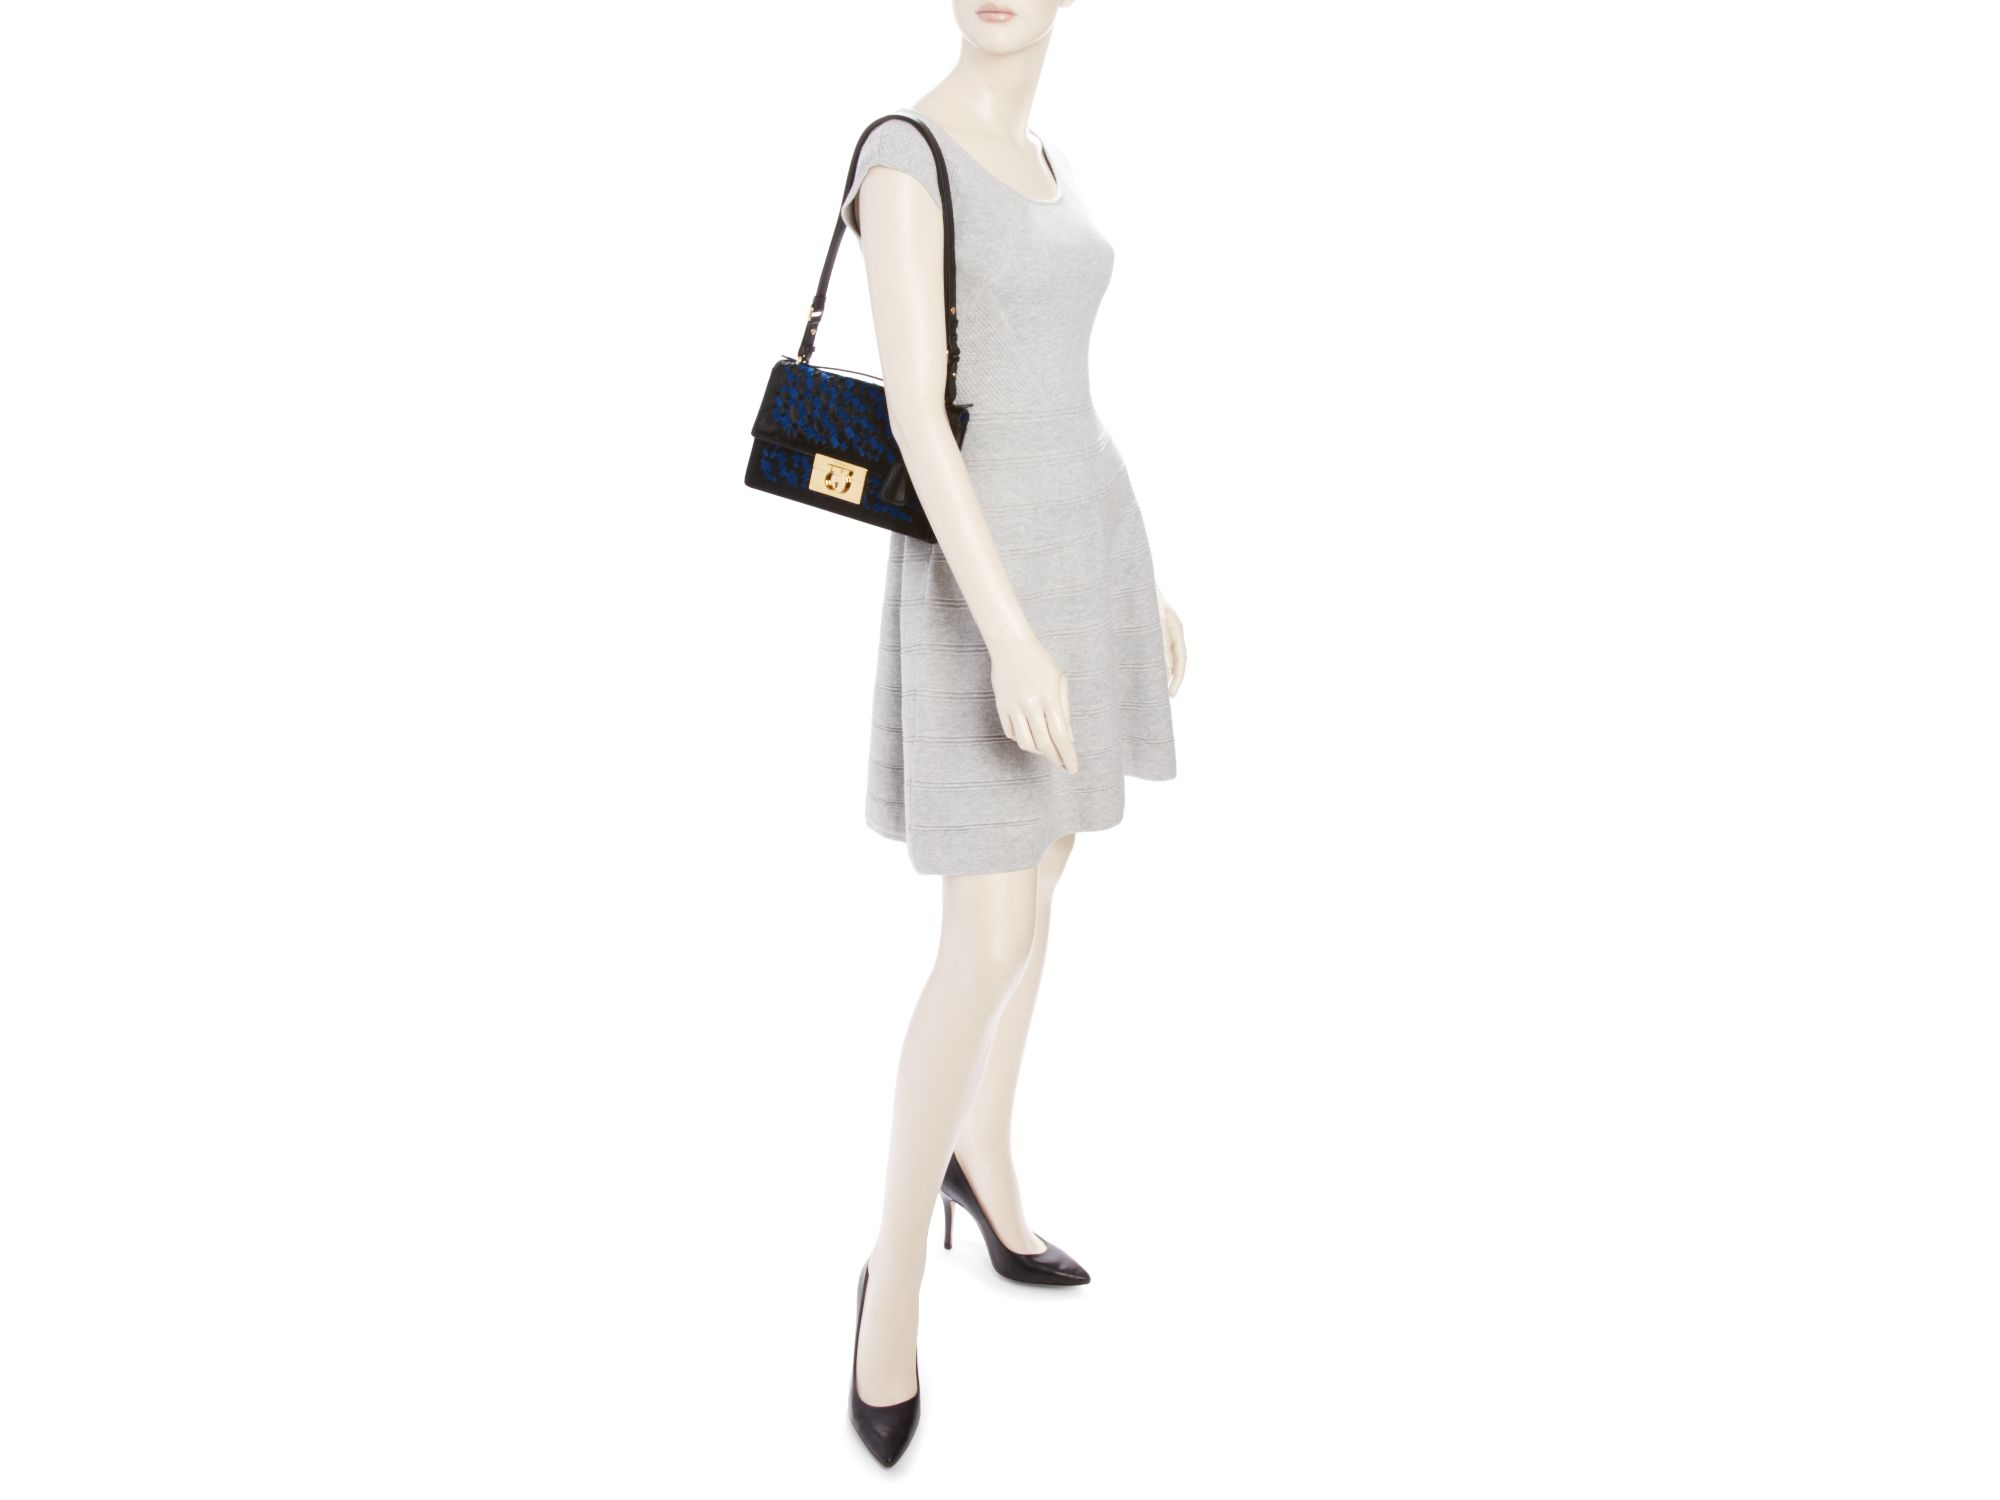 b807f74e4746 Lyst - Ferragamo Aileen Medium Interwoven Calf Hair Shoulder Bag in ...